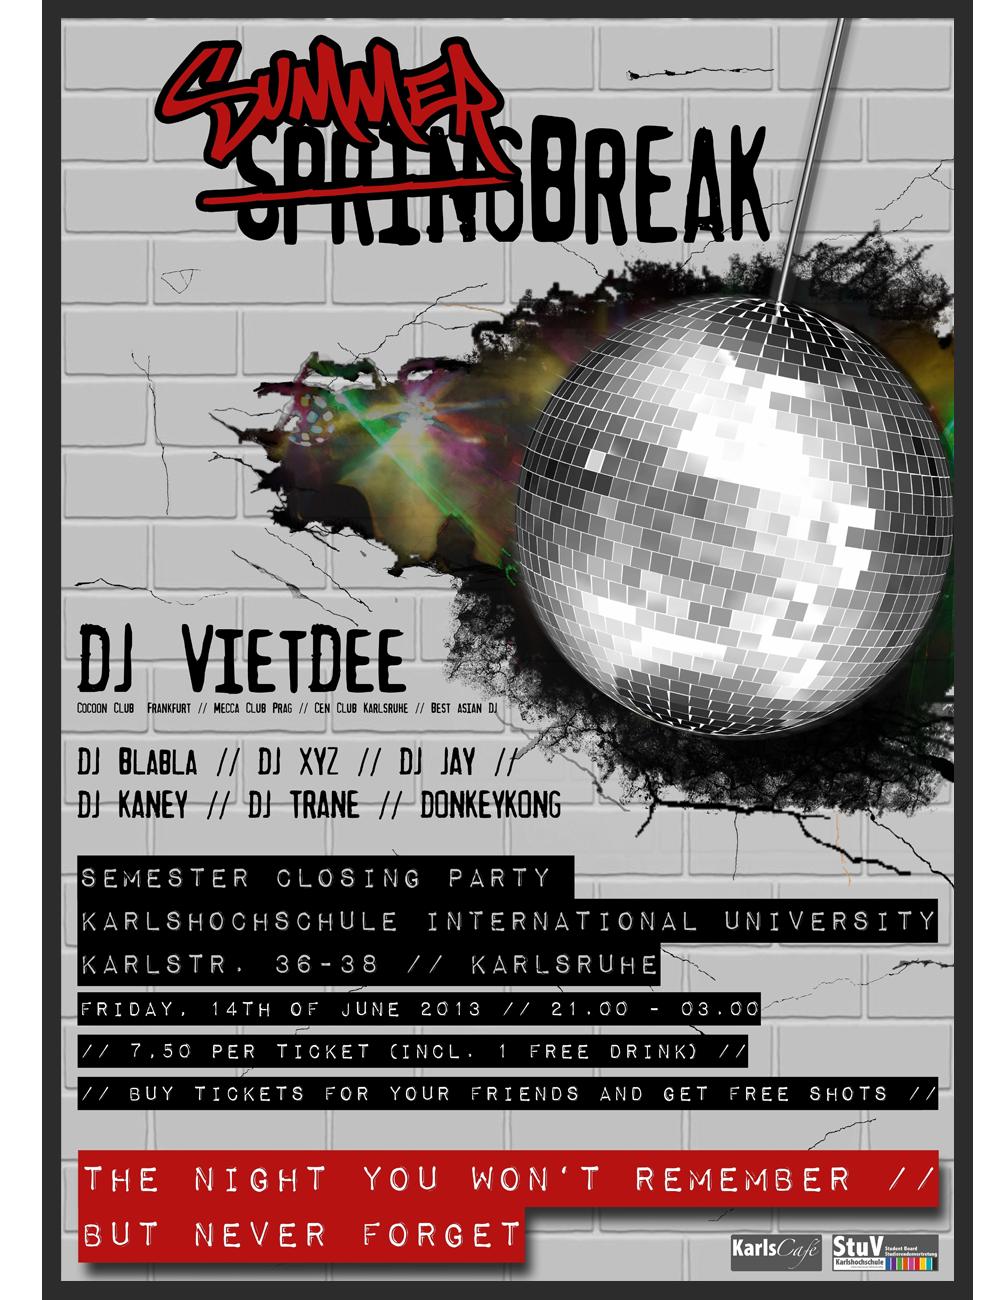 Summer SpringBreak Poster